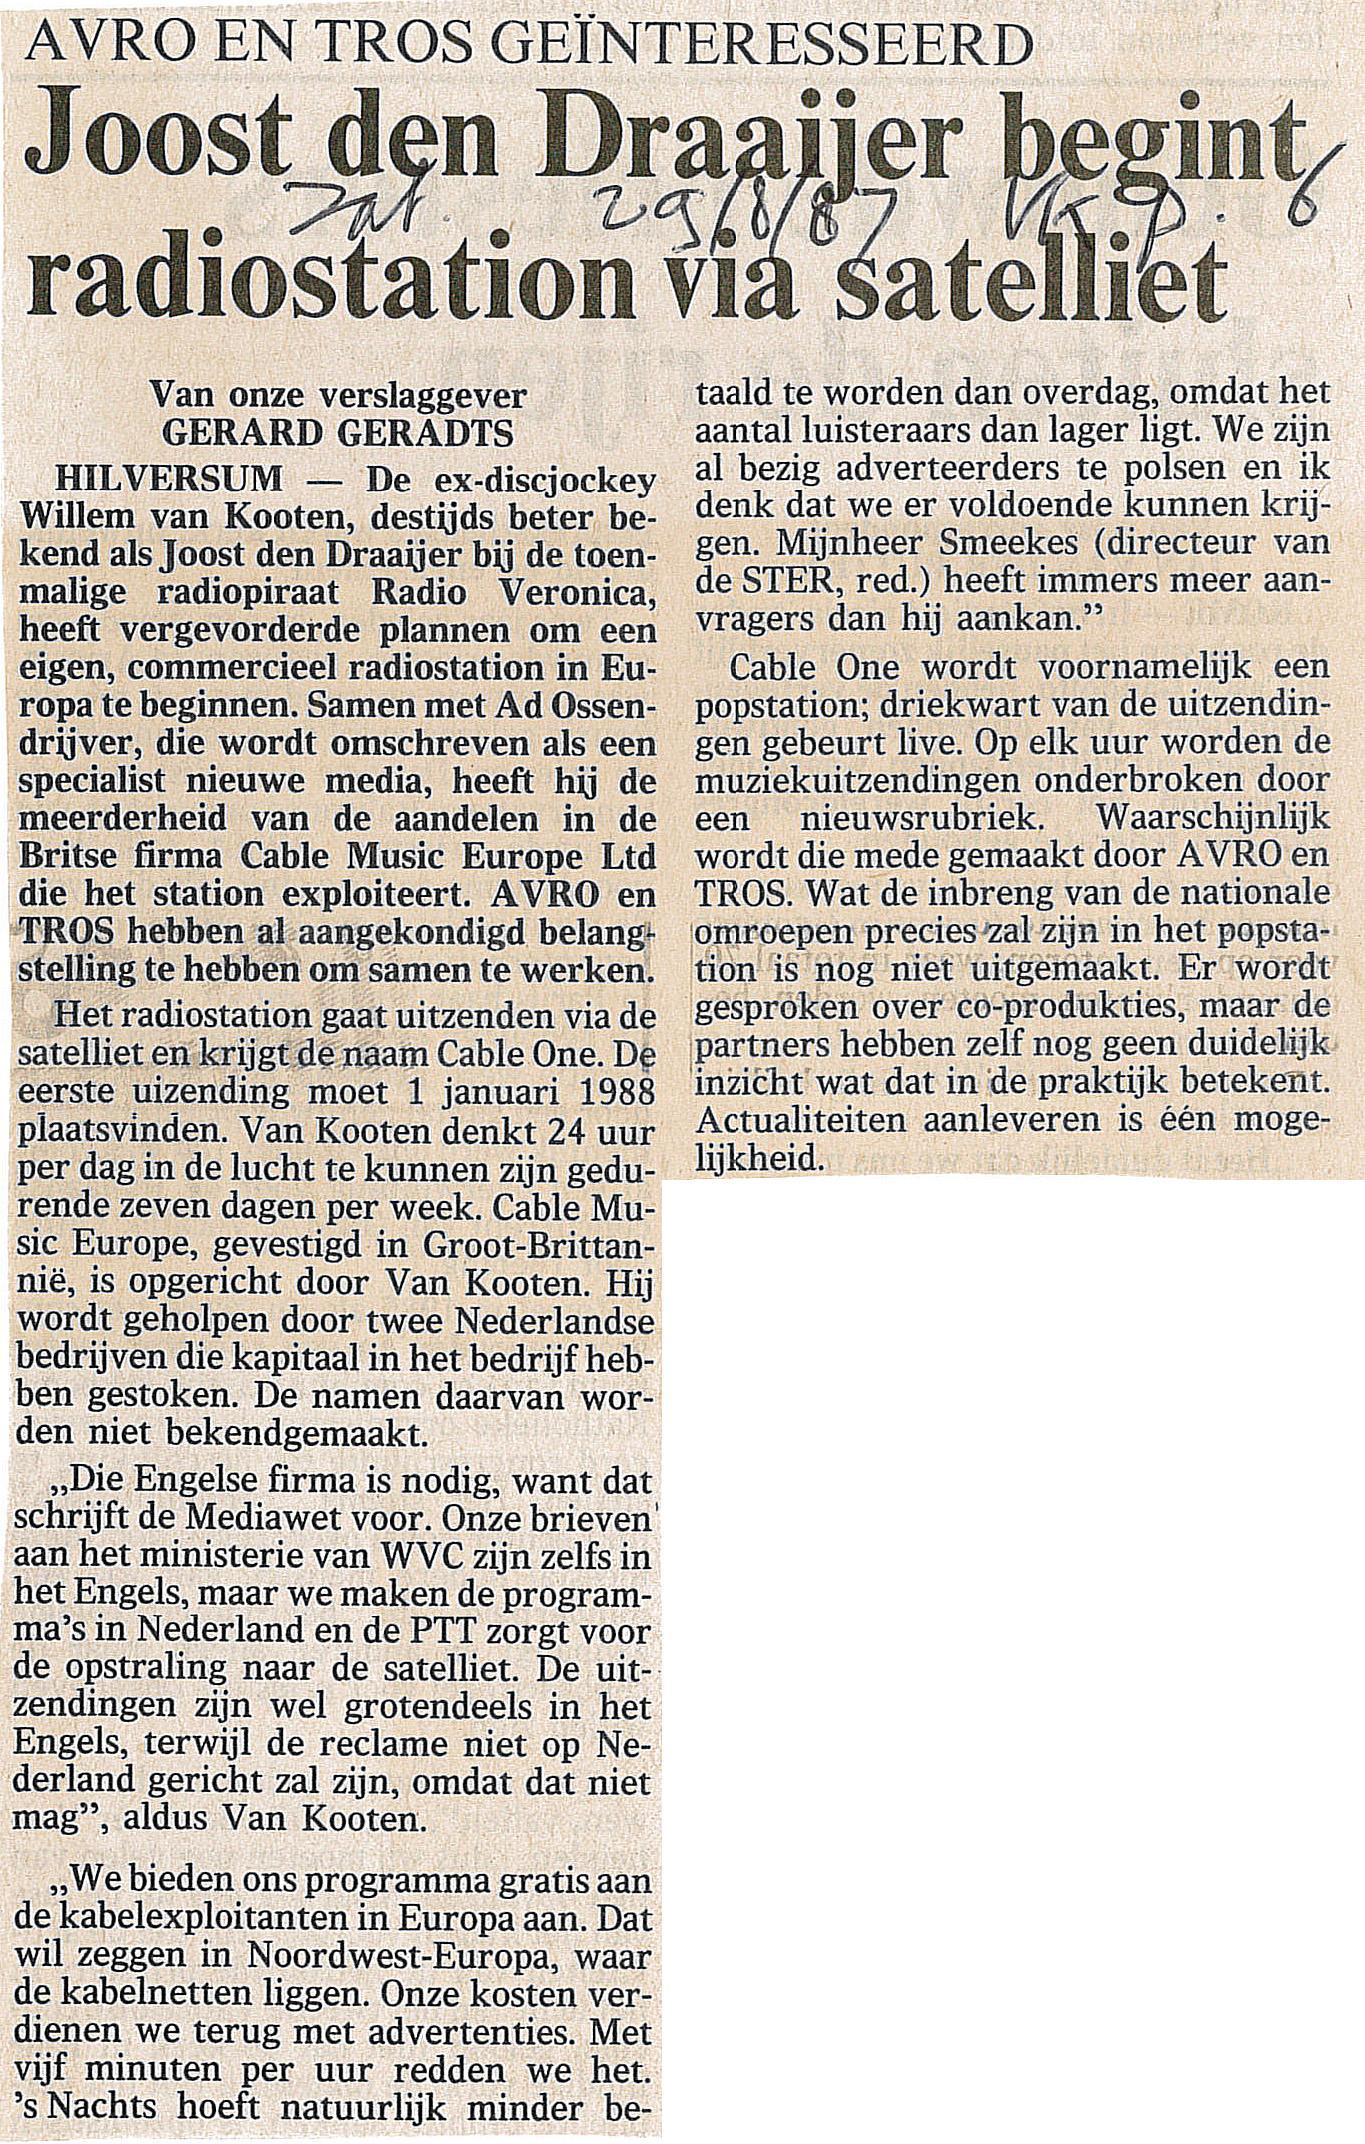 19870829 VK Joost den Draaijer begint radiostation via satelliet Cable one.jpg